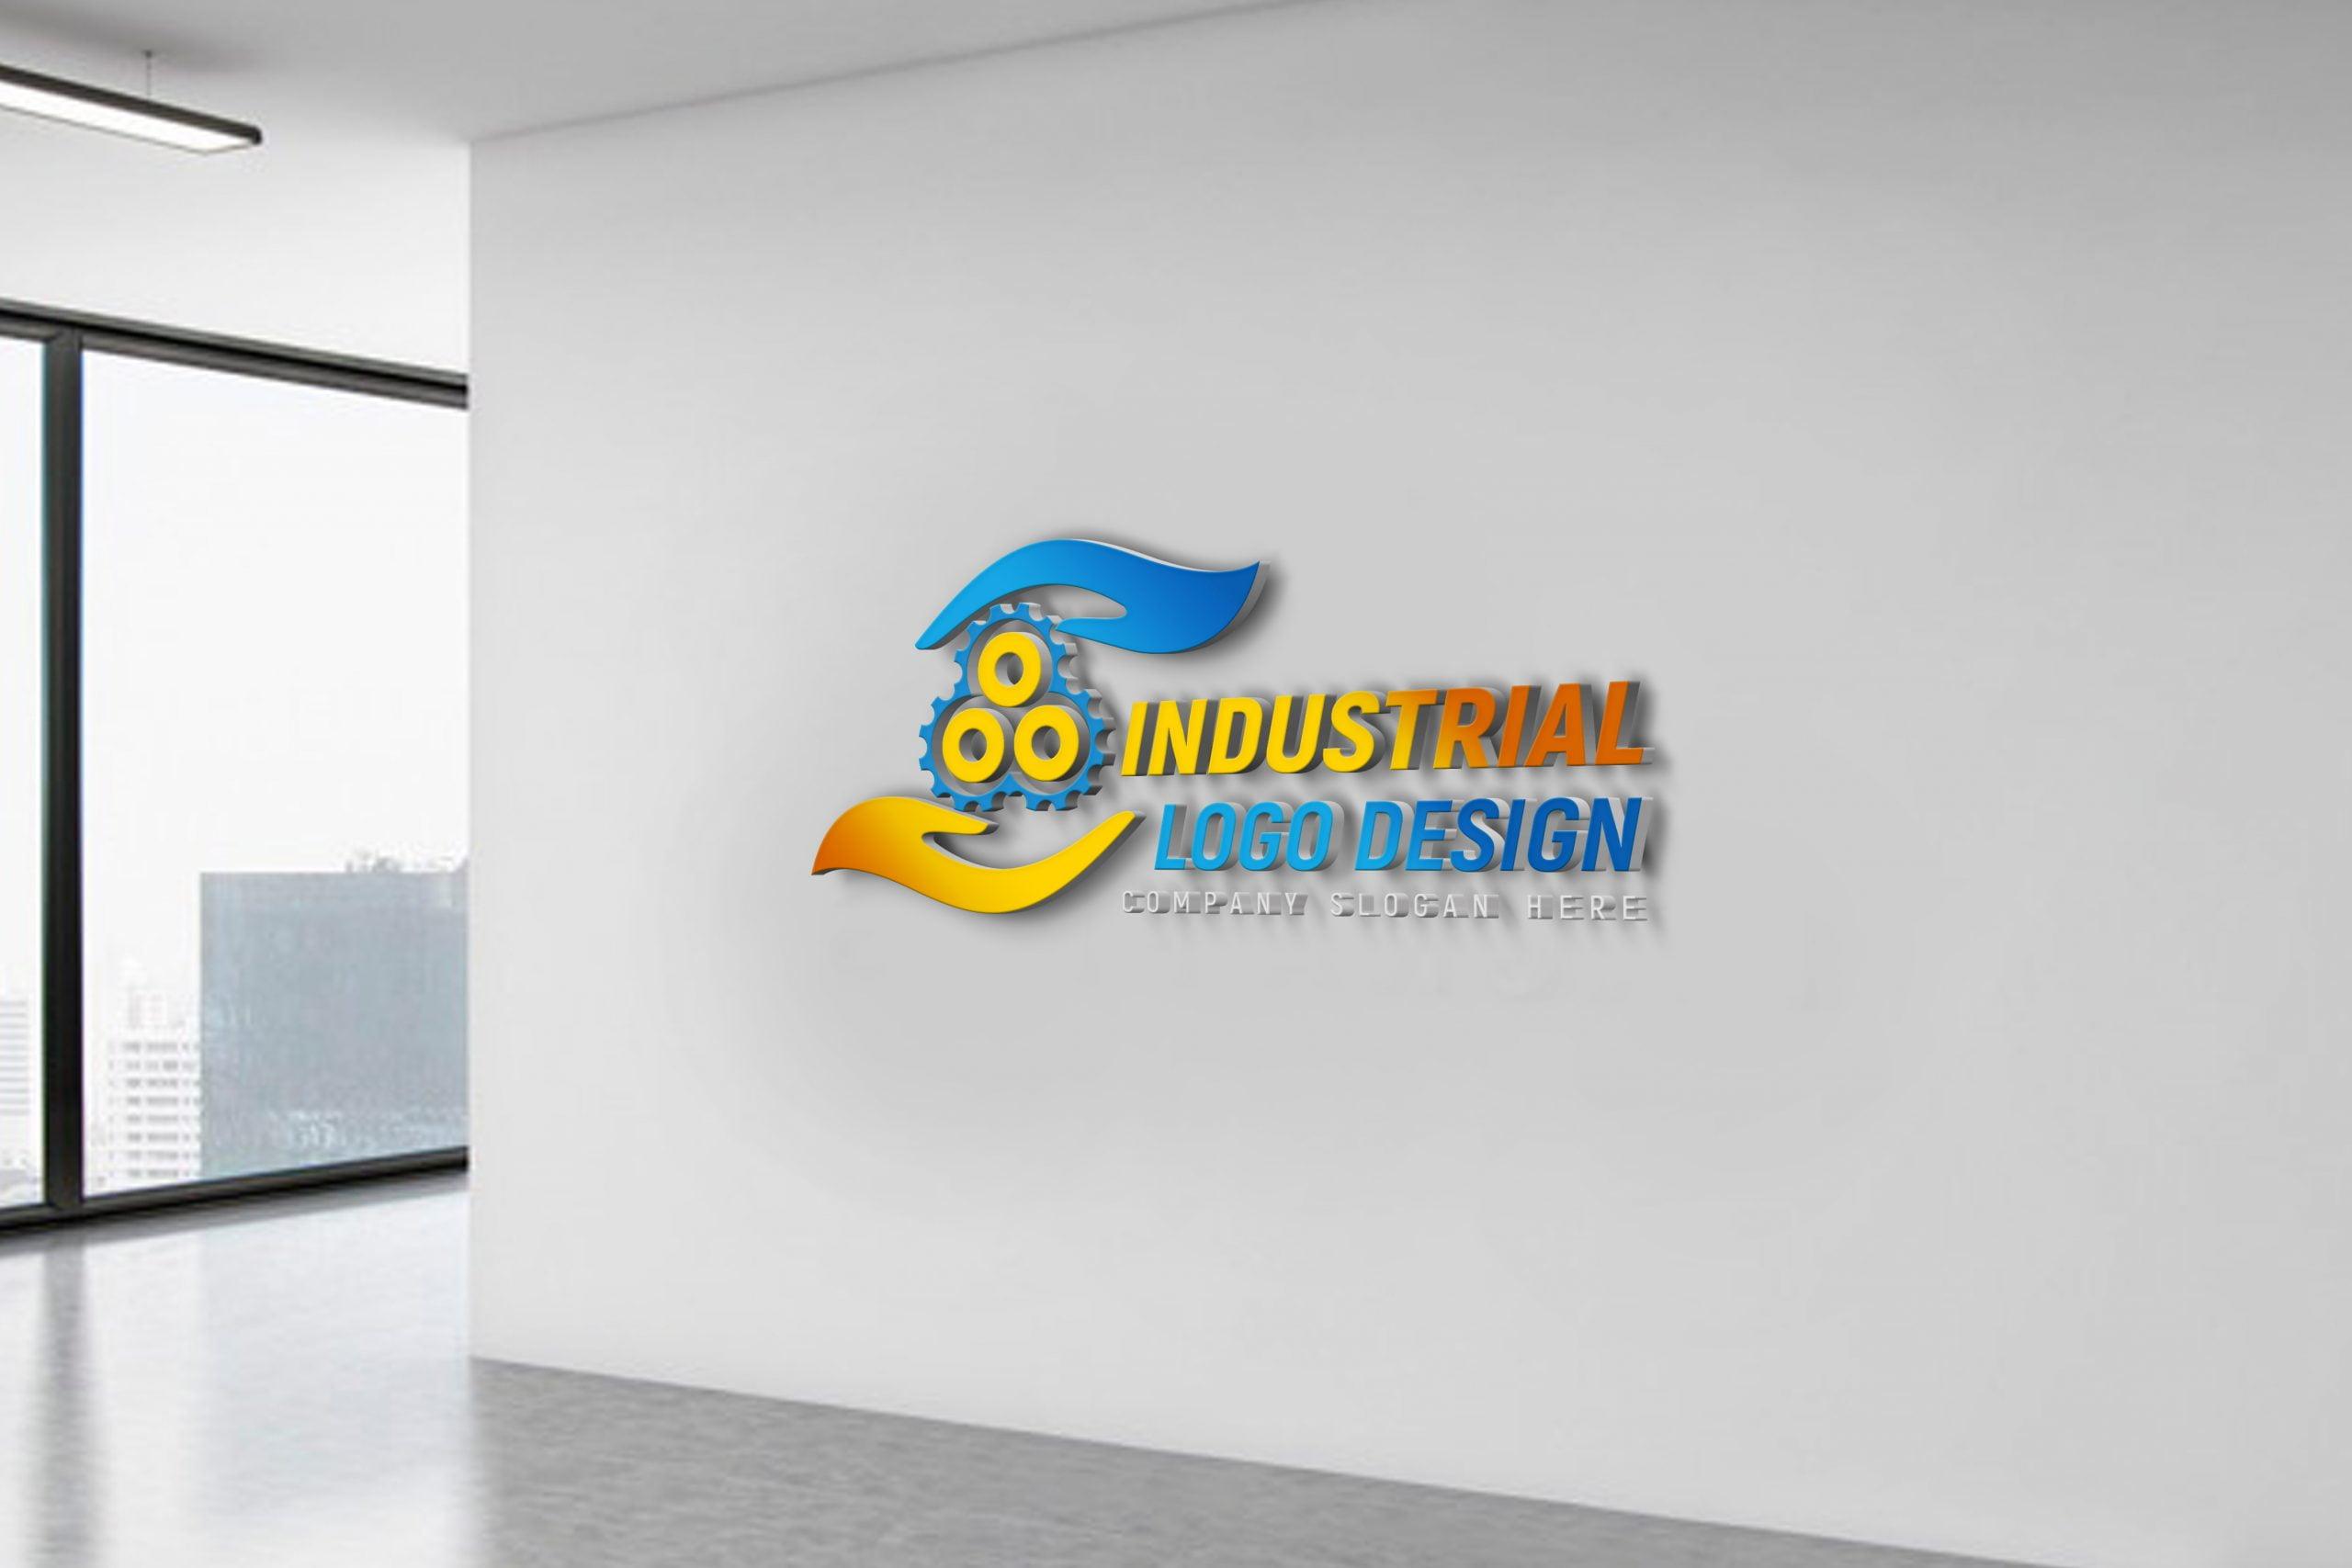 Free Editable Industrial Logo Design